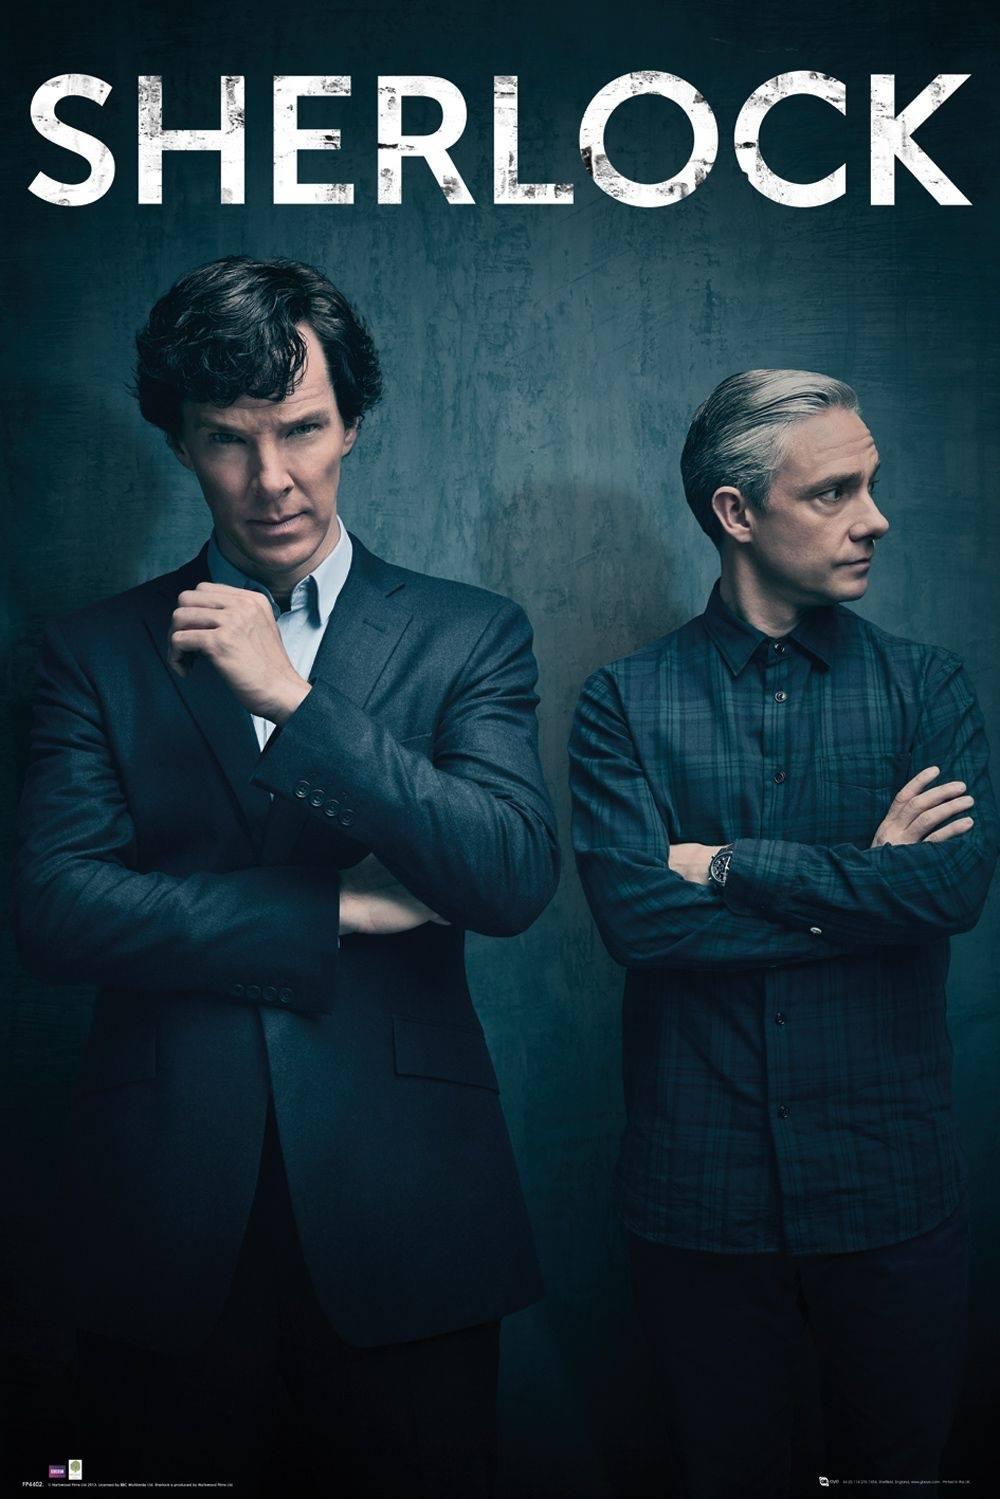 20+ Best SERIES of the Decade, Ranked Must See Netflix, HBO. - Aliens Tips. Sherlock alienstips